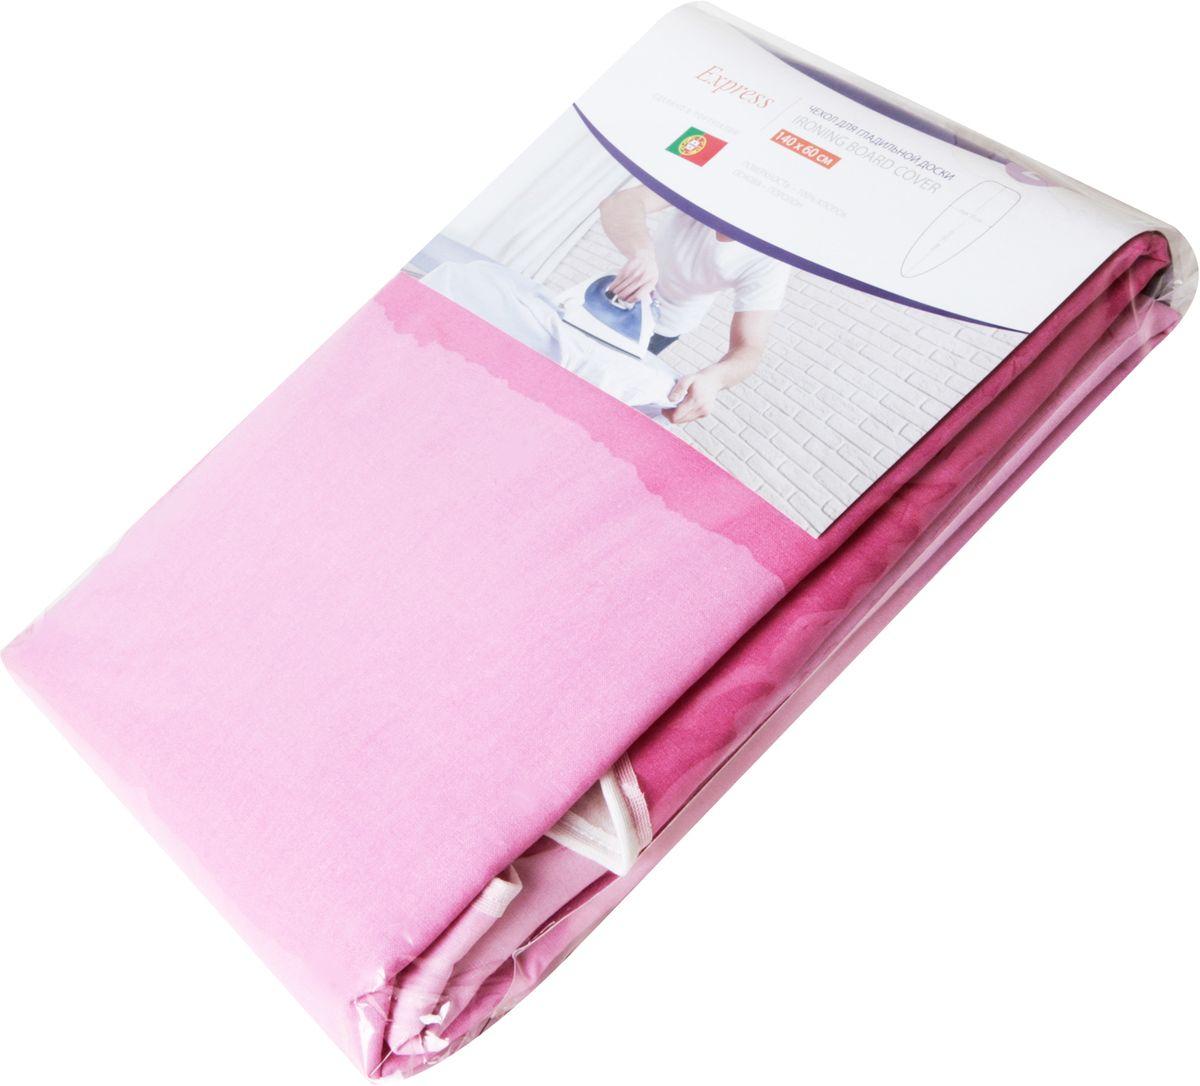 Чехол для гладильной доски Attribute Express, цвет: розовый, 140 х 60 смABE105